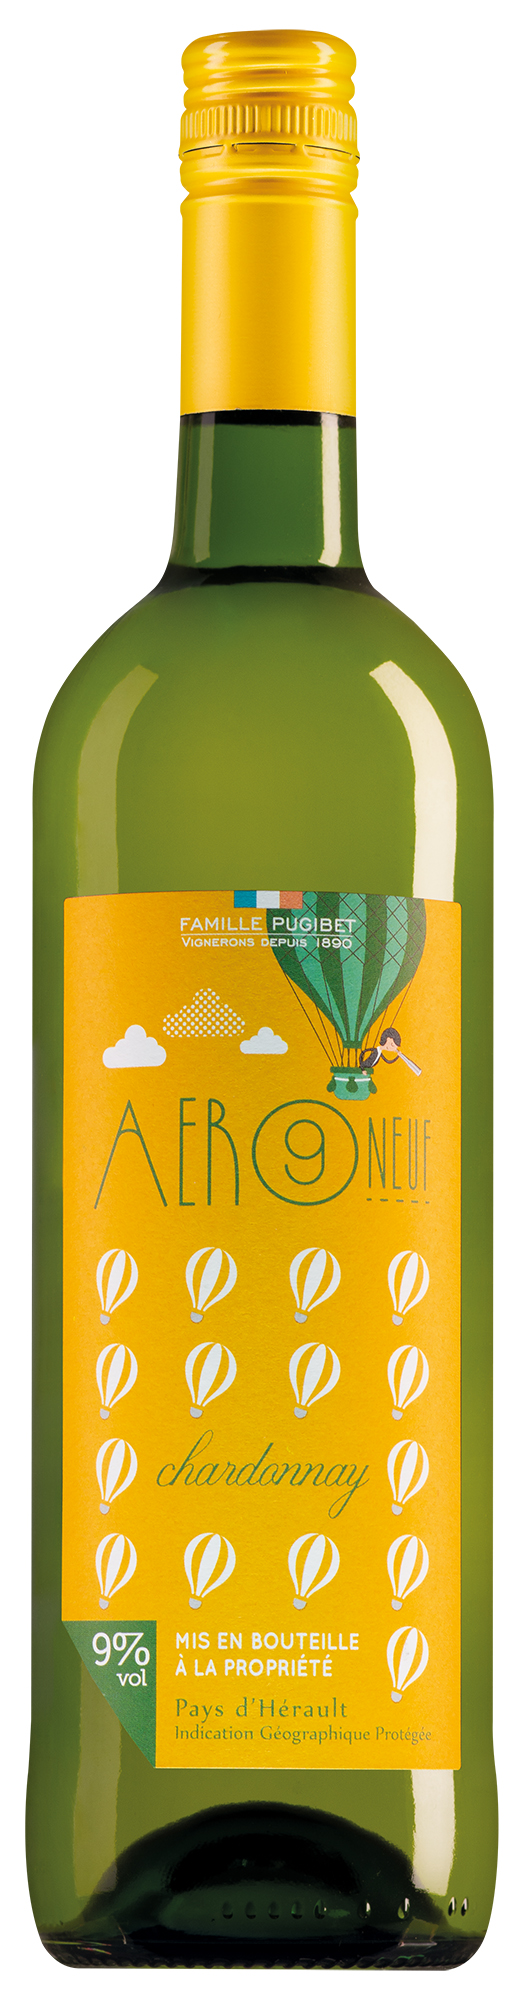 Famille Pugibet Pays'd'Hérault Aer Neuf Chardonnay